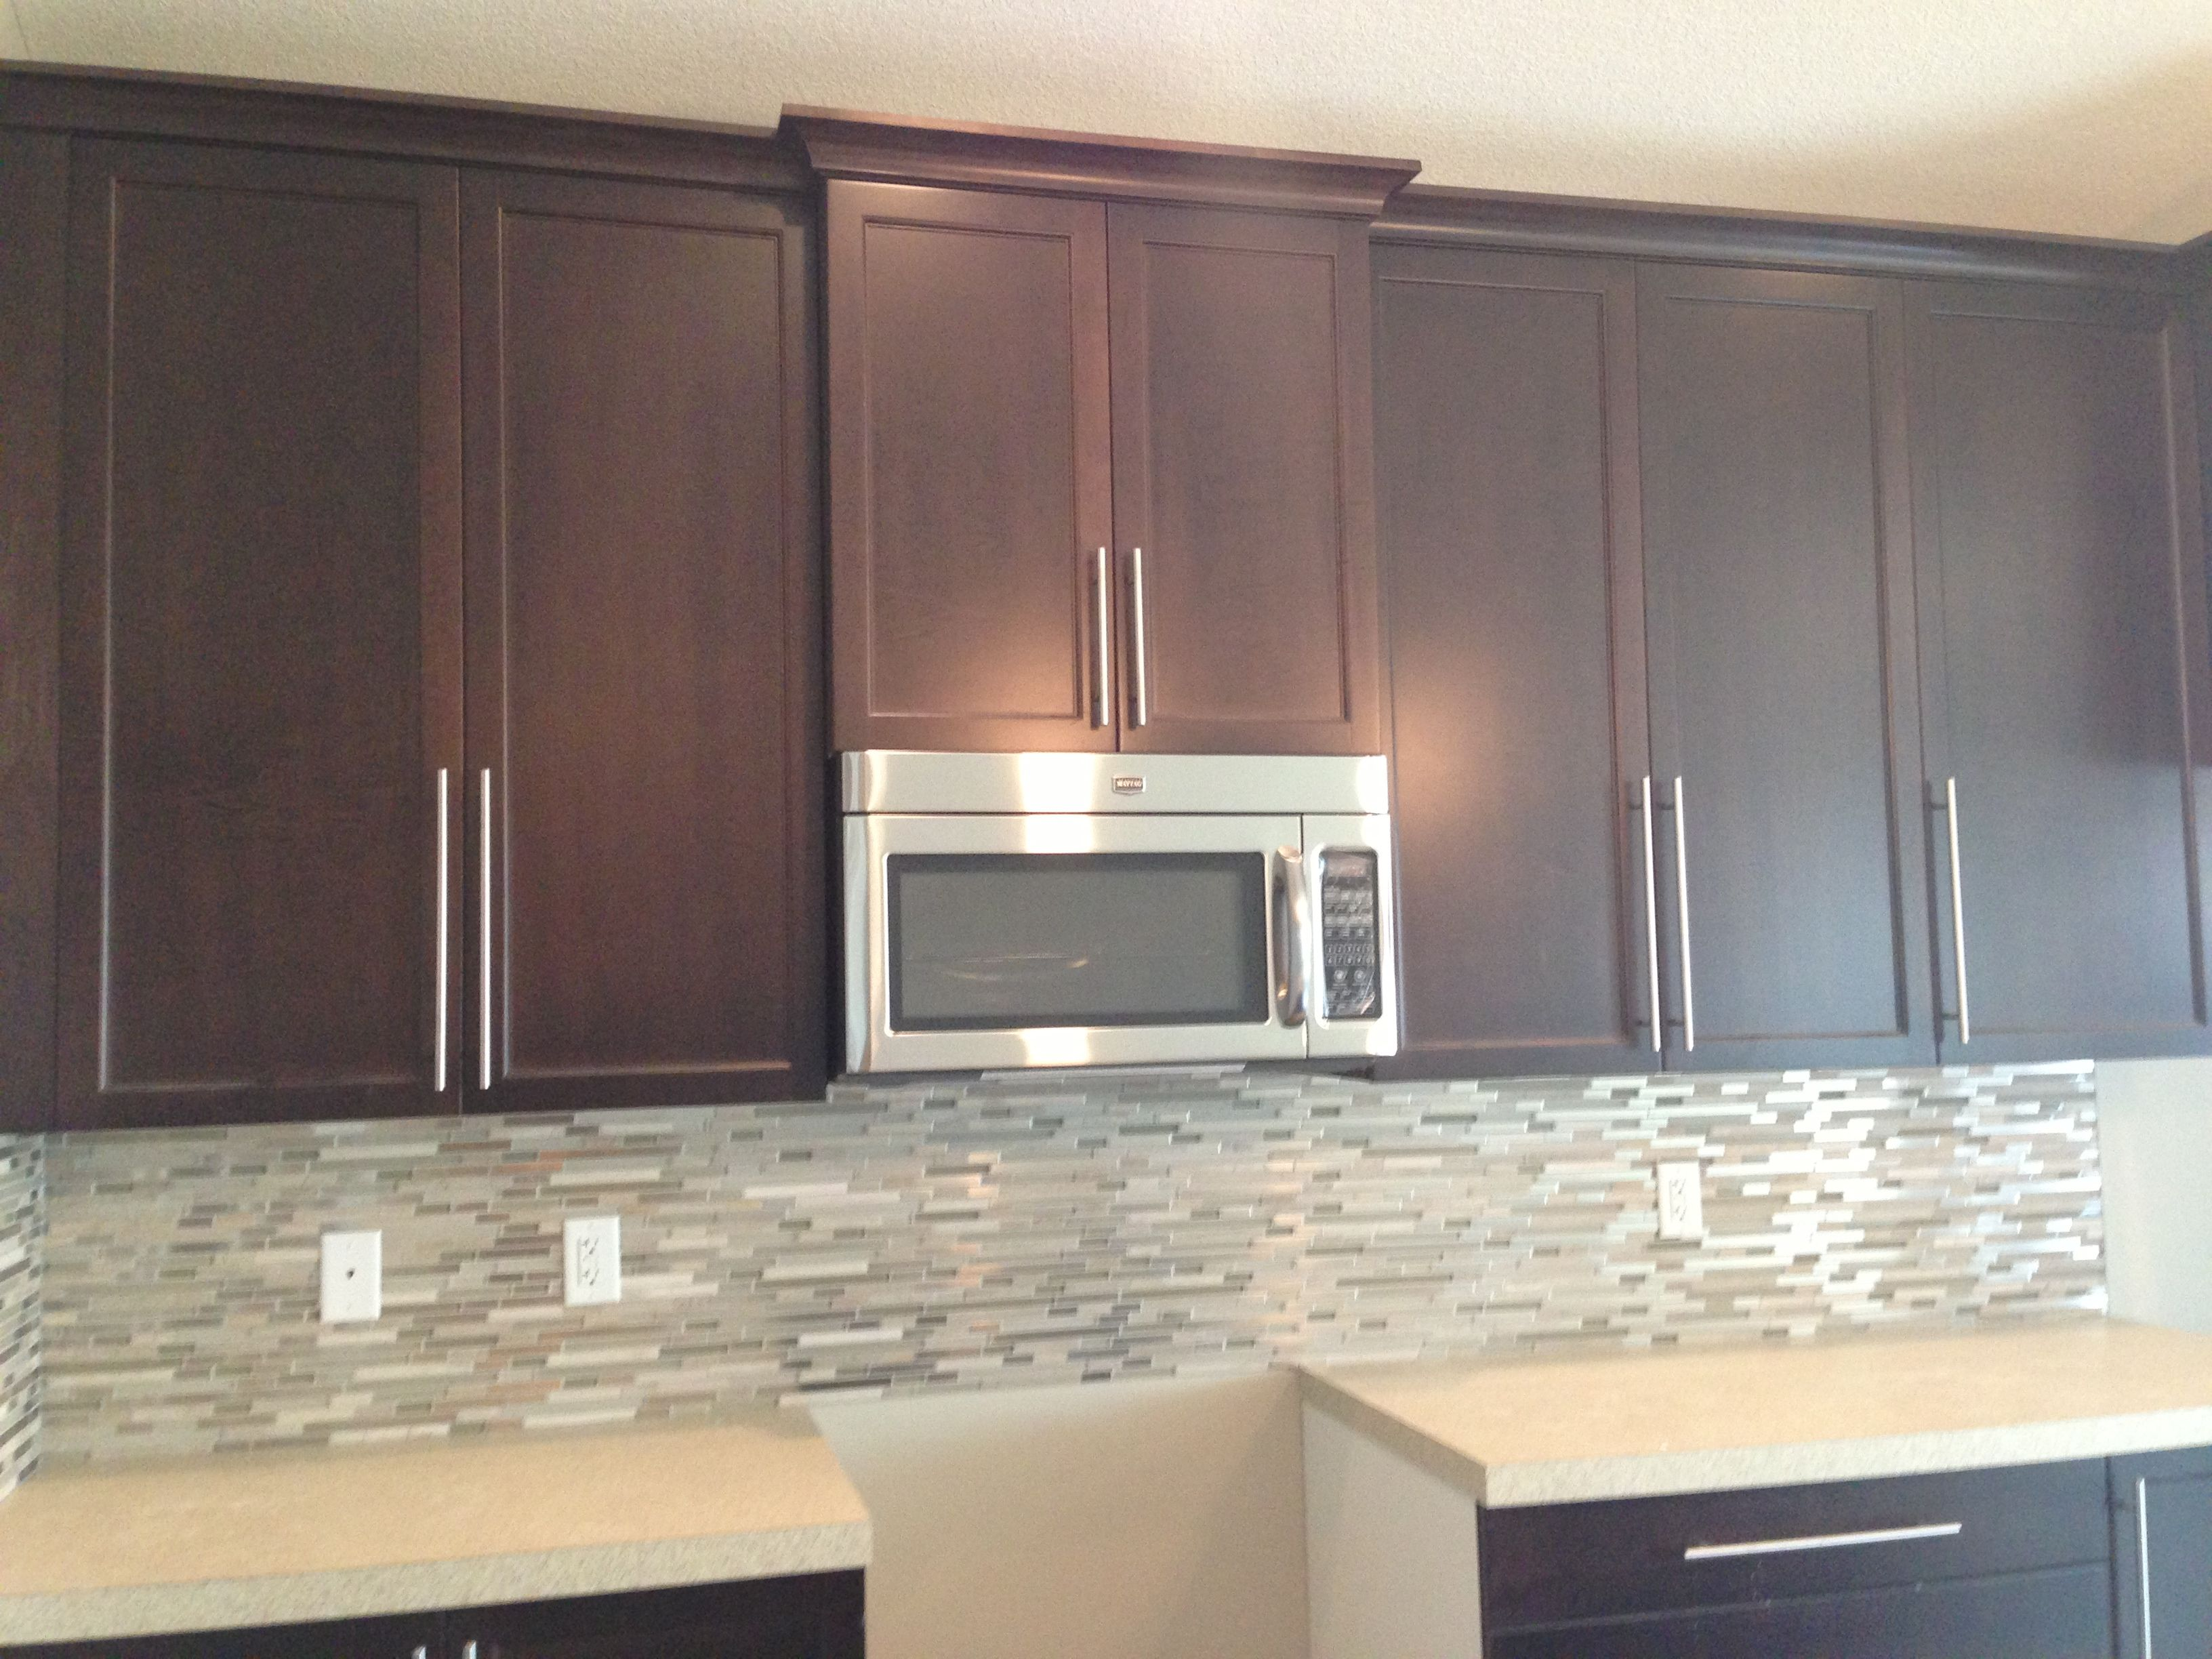 48 Inch Upper Cabinets With Clay Titanium Mosaic Tile Backsplash.